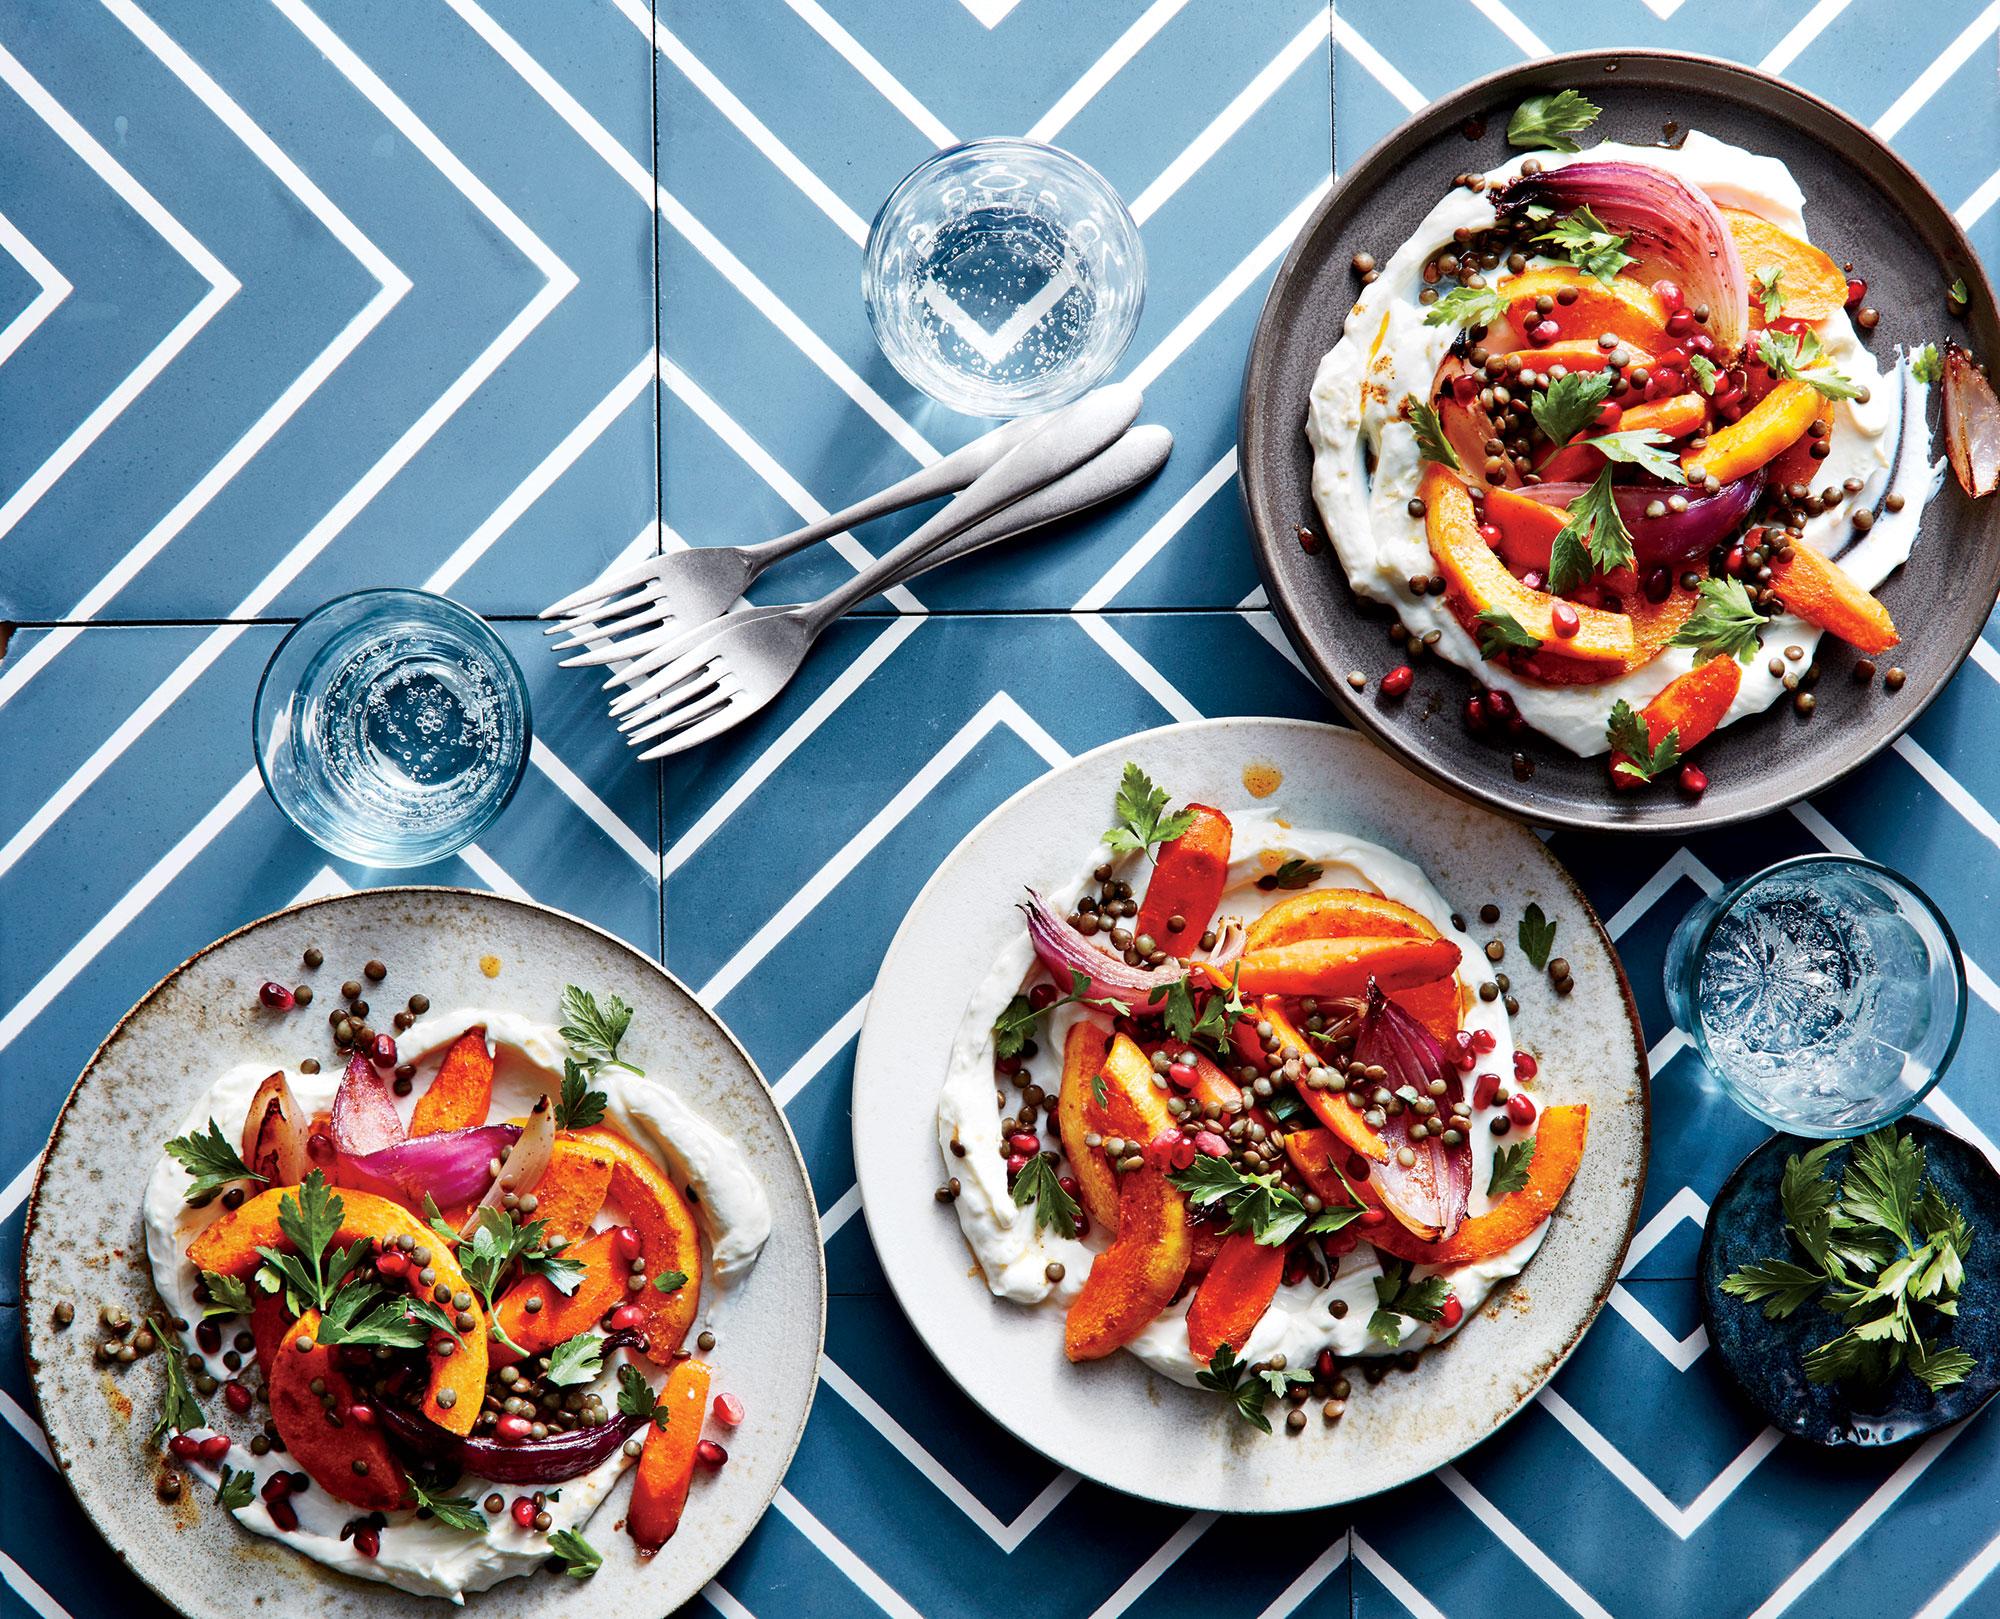 Fall Vegetable and Lentil Salad